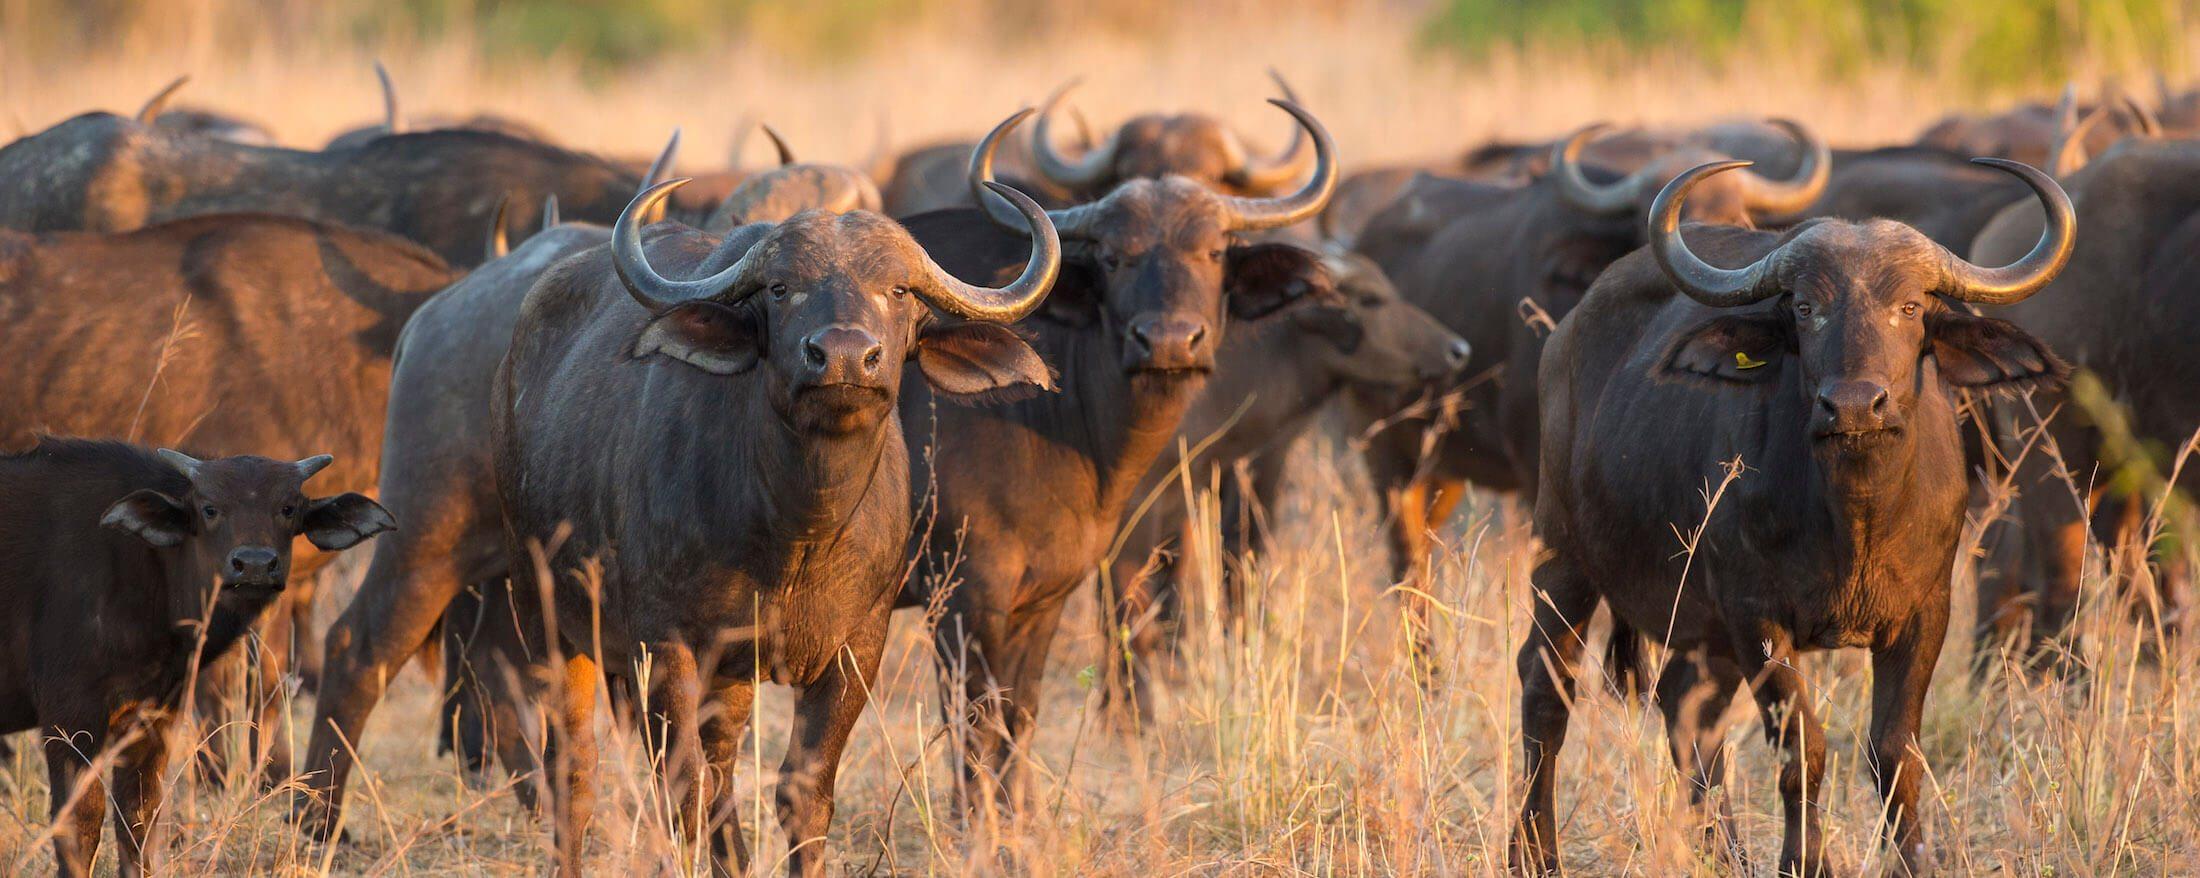 Getting The Best Value For Money on Safari | Art Of Safari